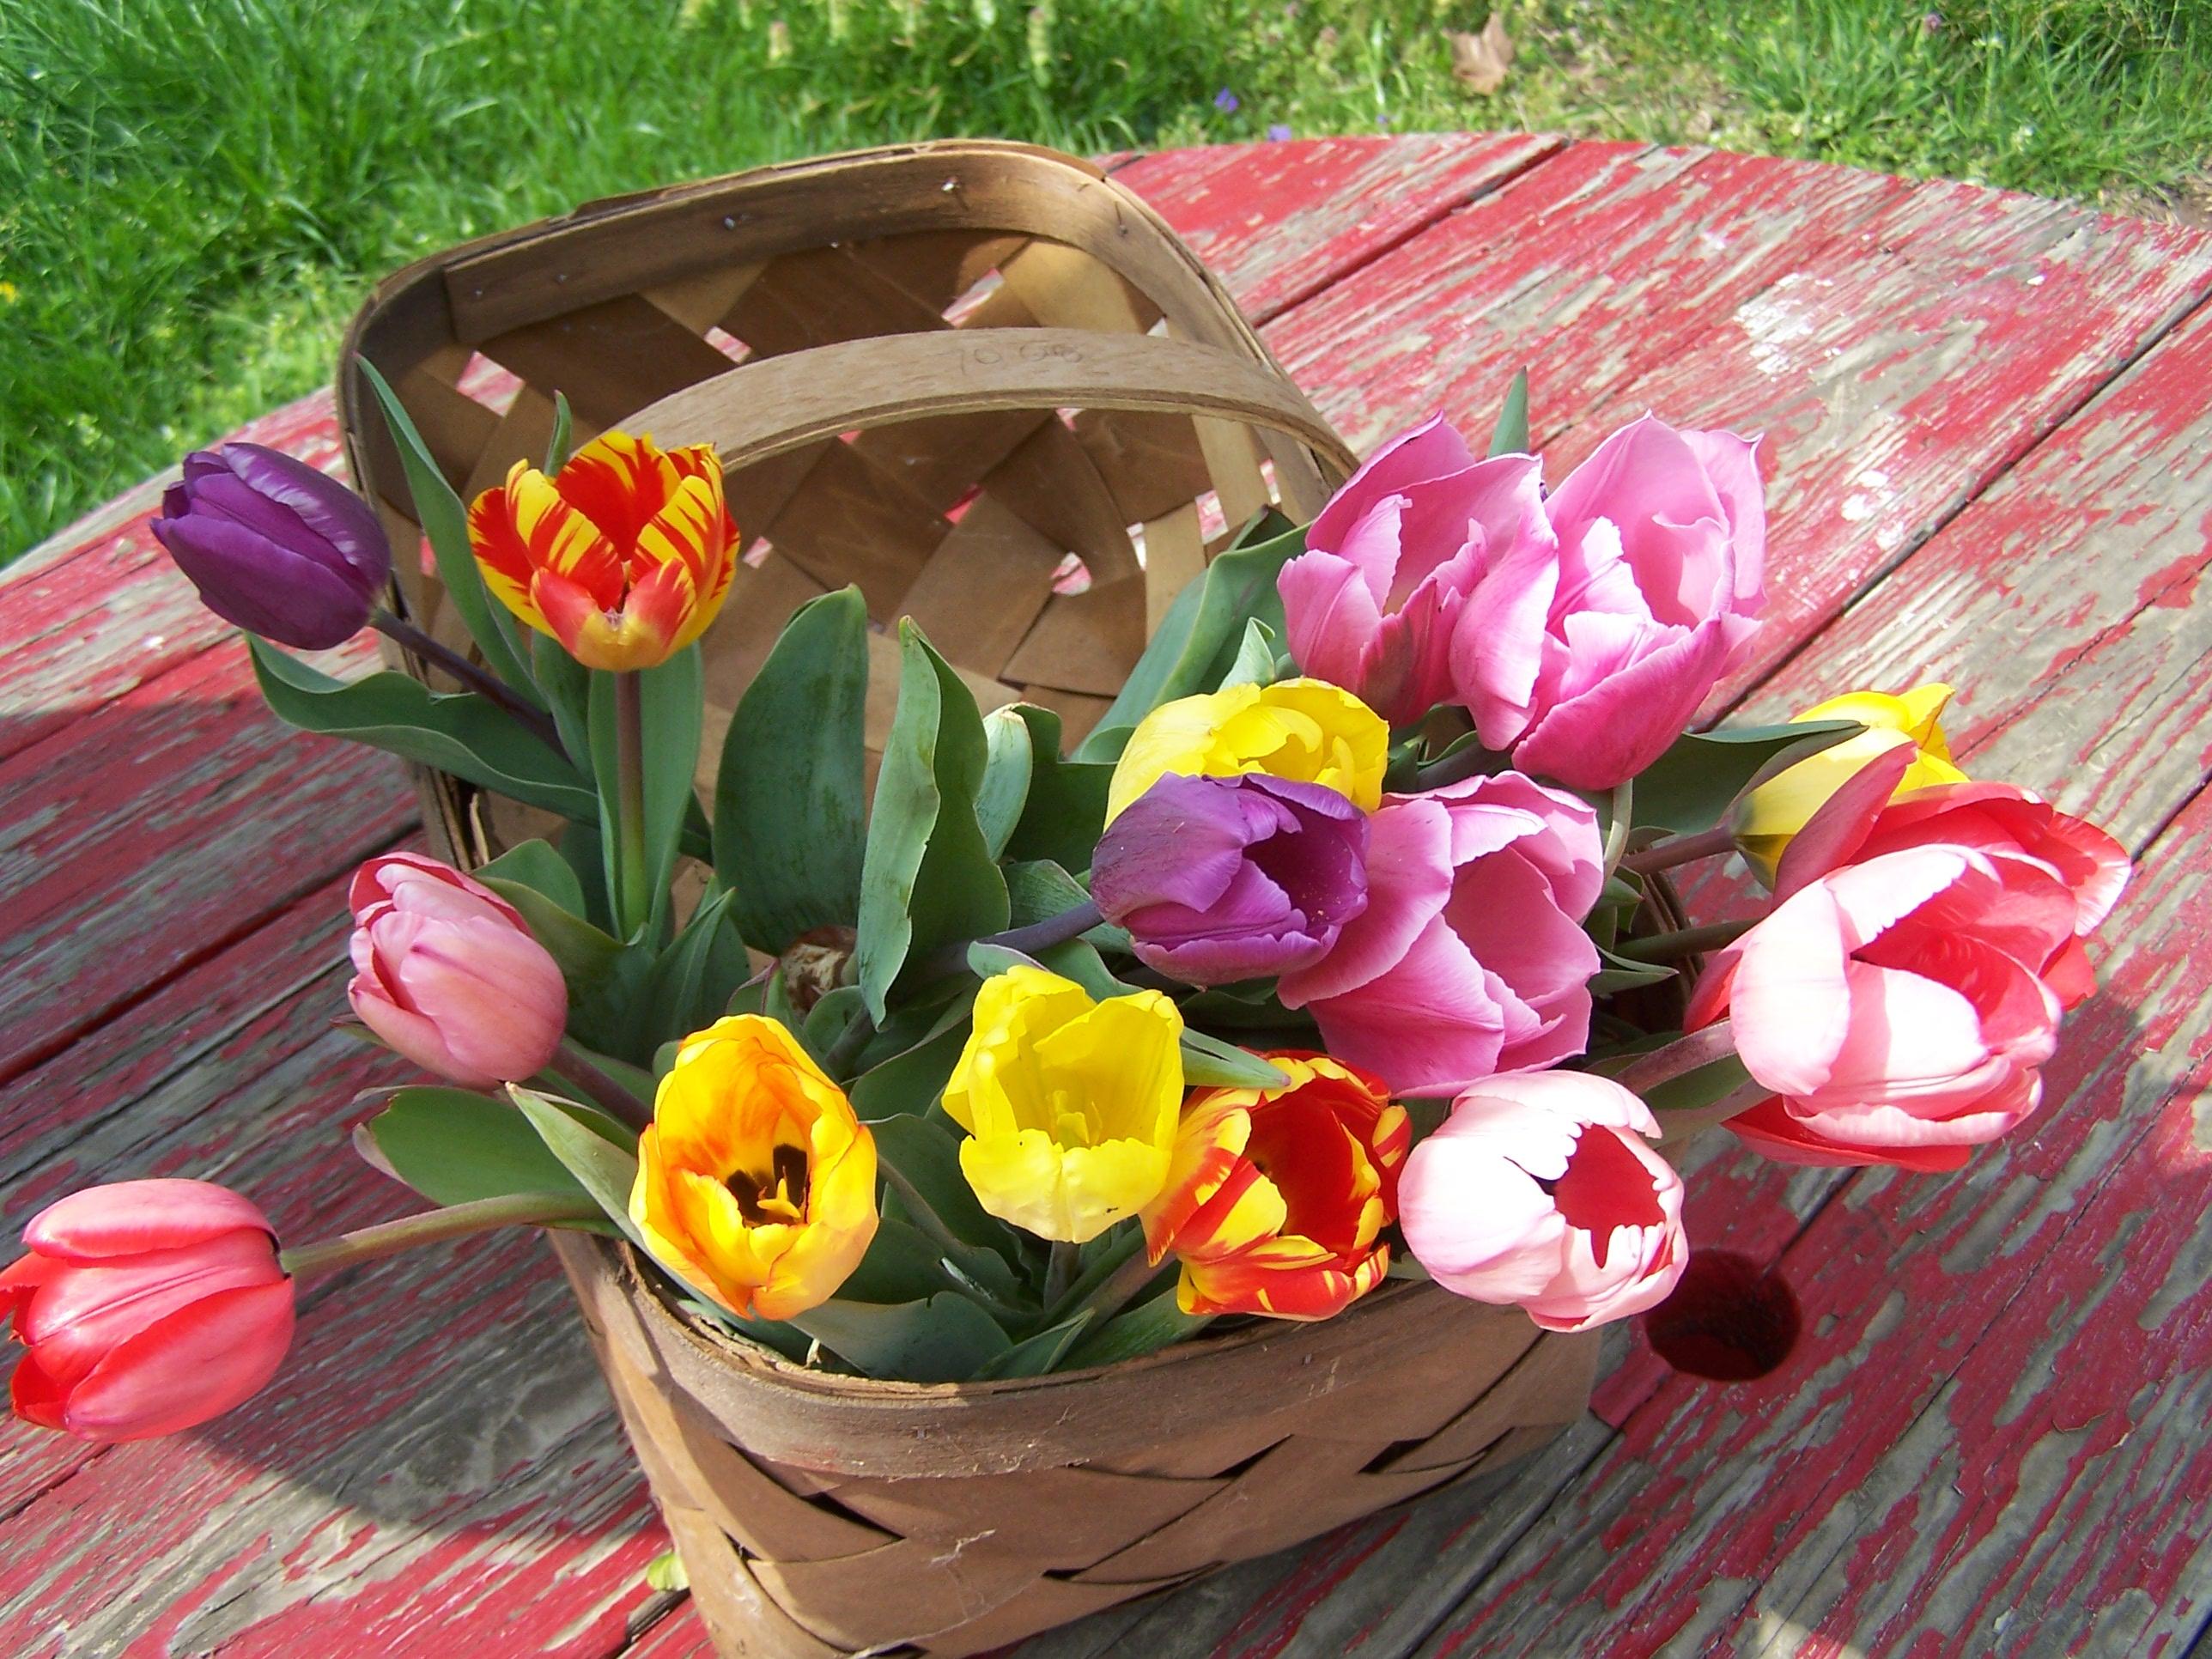 Kukyflor Cuatro Razones Para Decorar Con Tulipanes 3,163 likes · 1,043 talking about this. cuatro razones para decorar con tulipanes